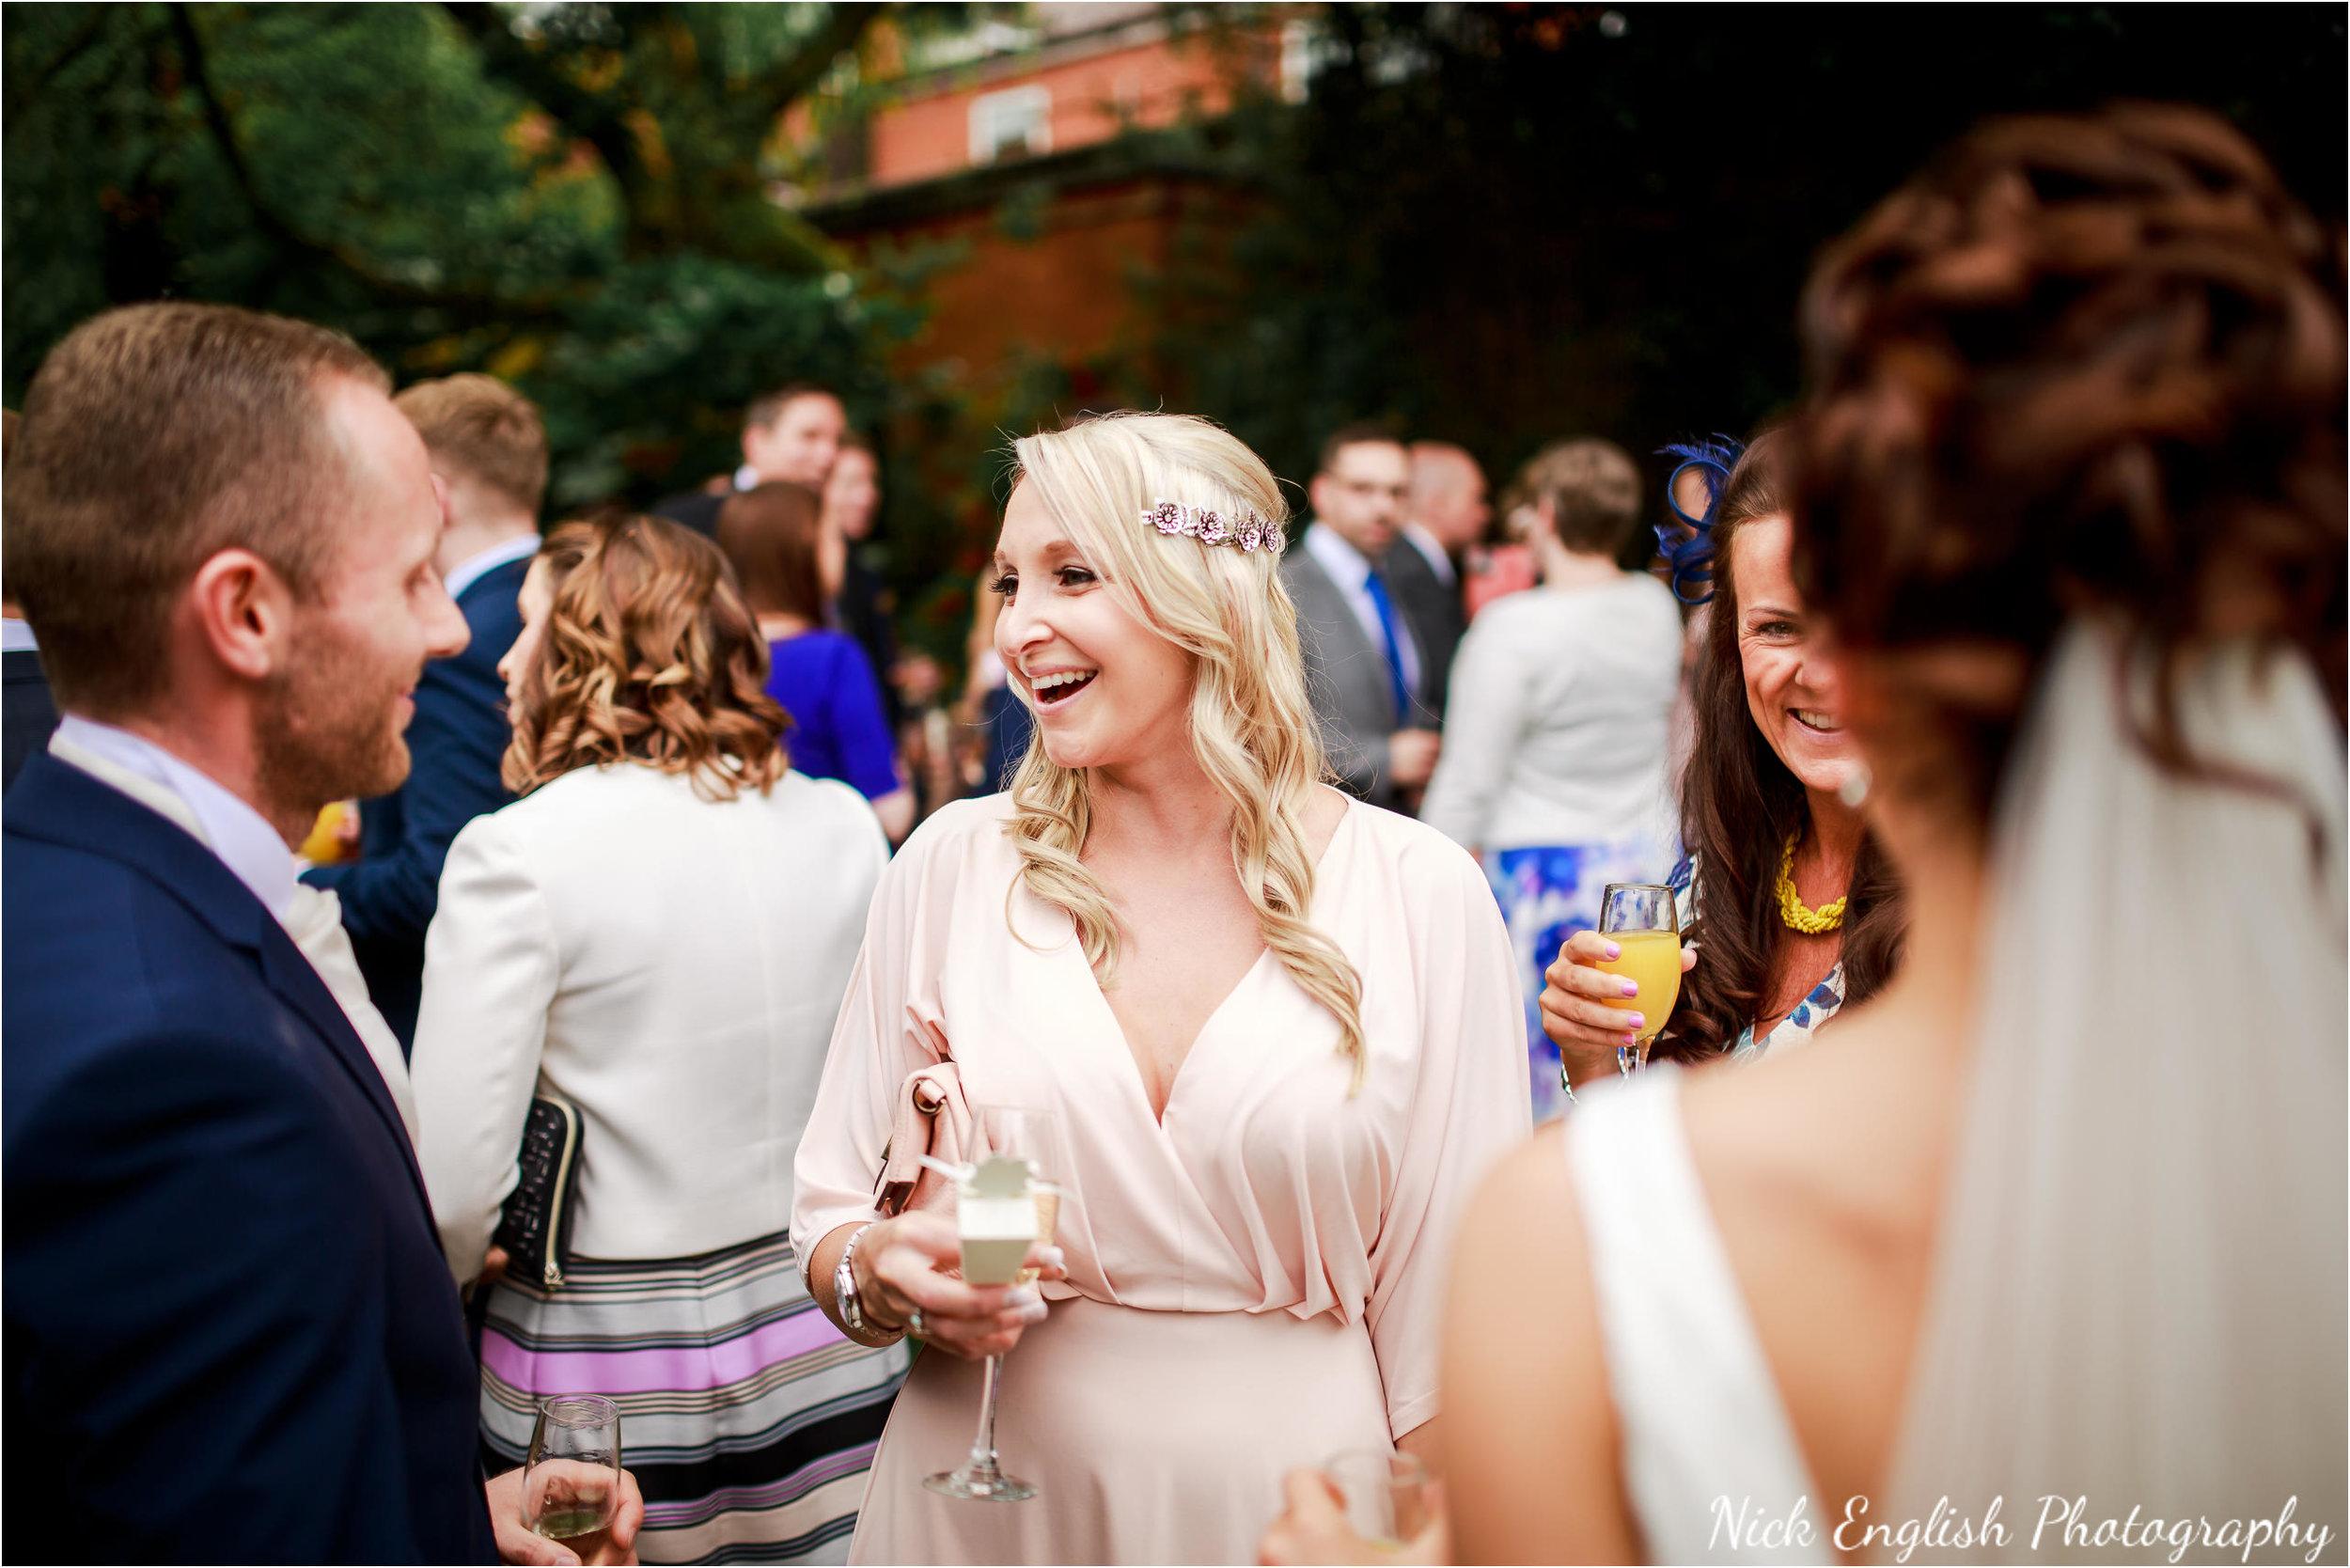 Emily David Wedding Photographs at Barton Grange Preston by Nick English Photography 107jpg.jpeg